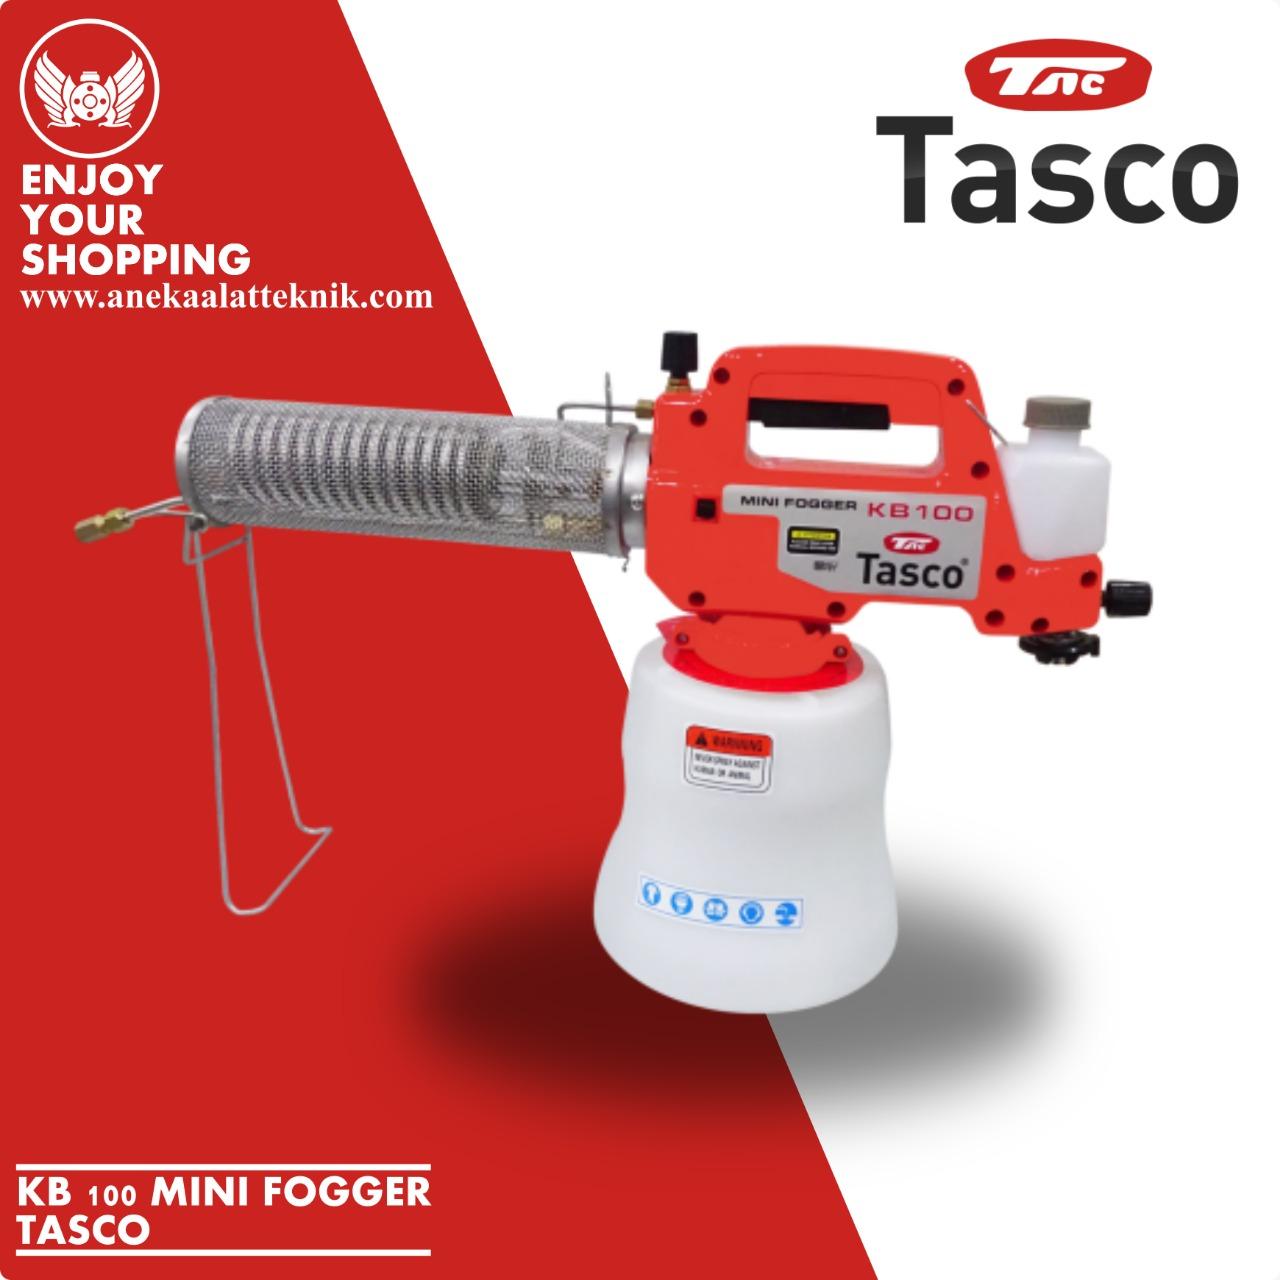 Jual Mesin Fogging Tasco KB 100